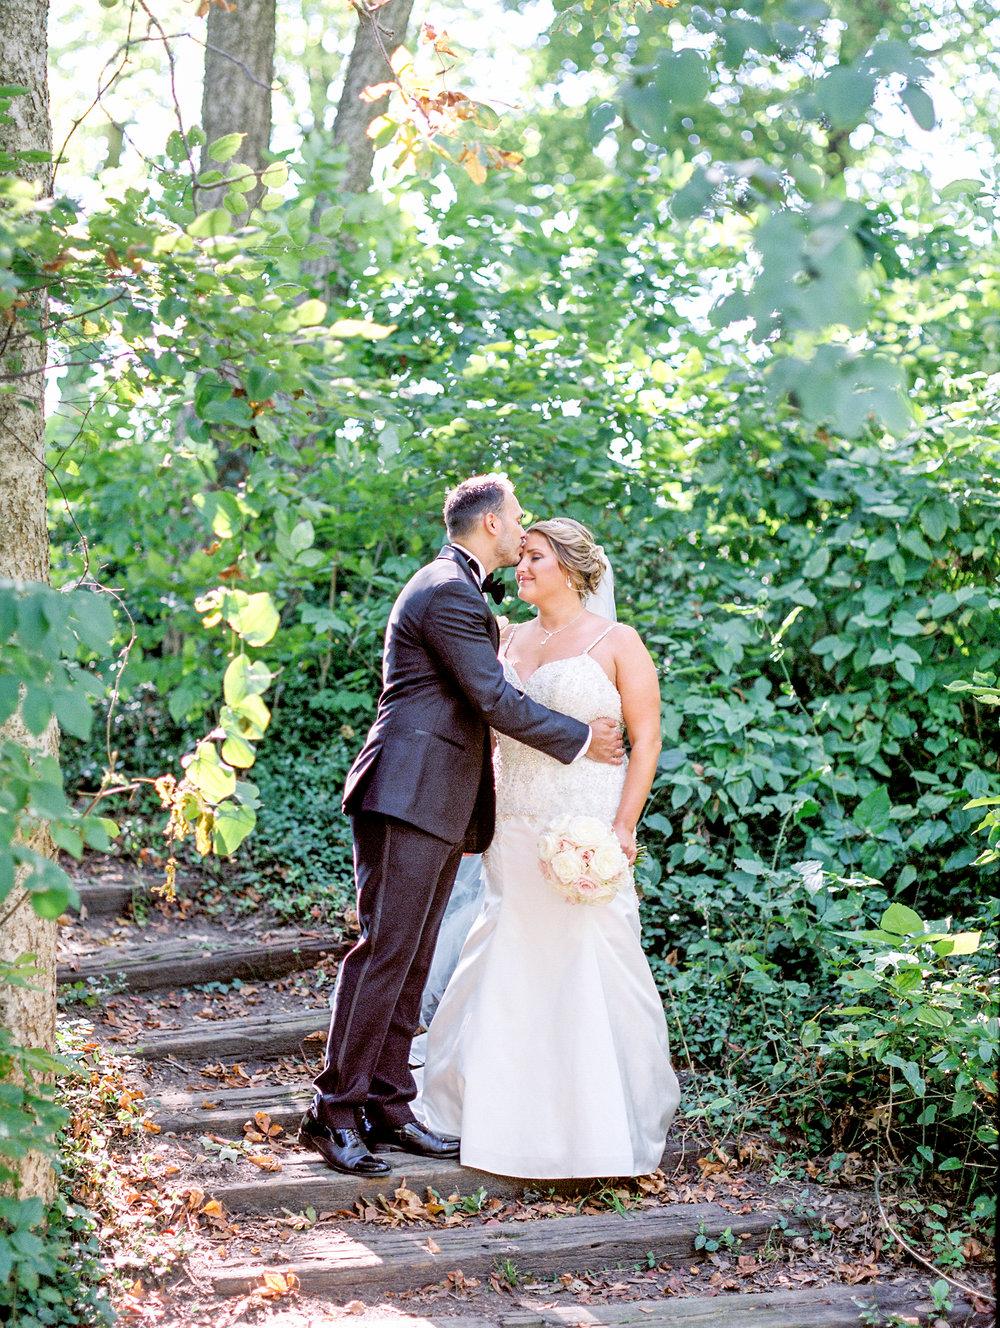 Lisa Silva Photography- Jacksonville, Florida Fine Art Film Wedding Photography (137 of 203).jpg